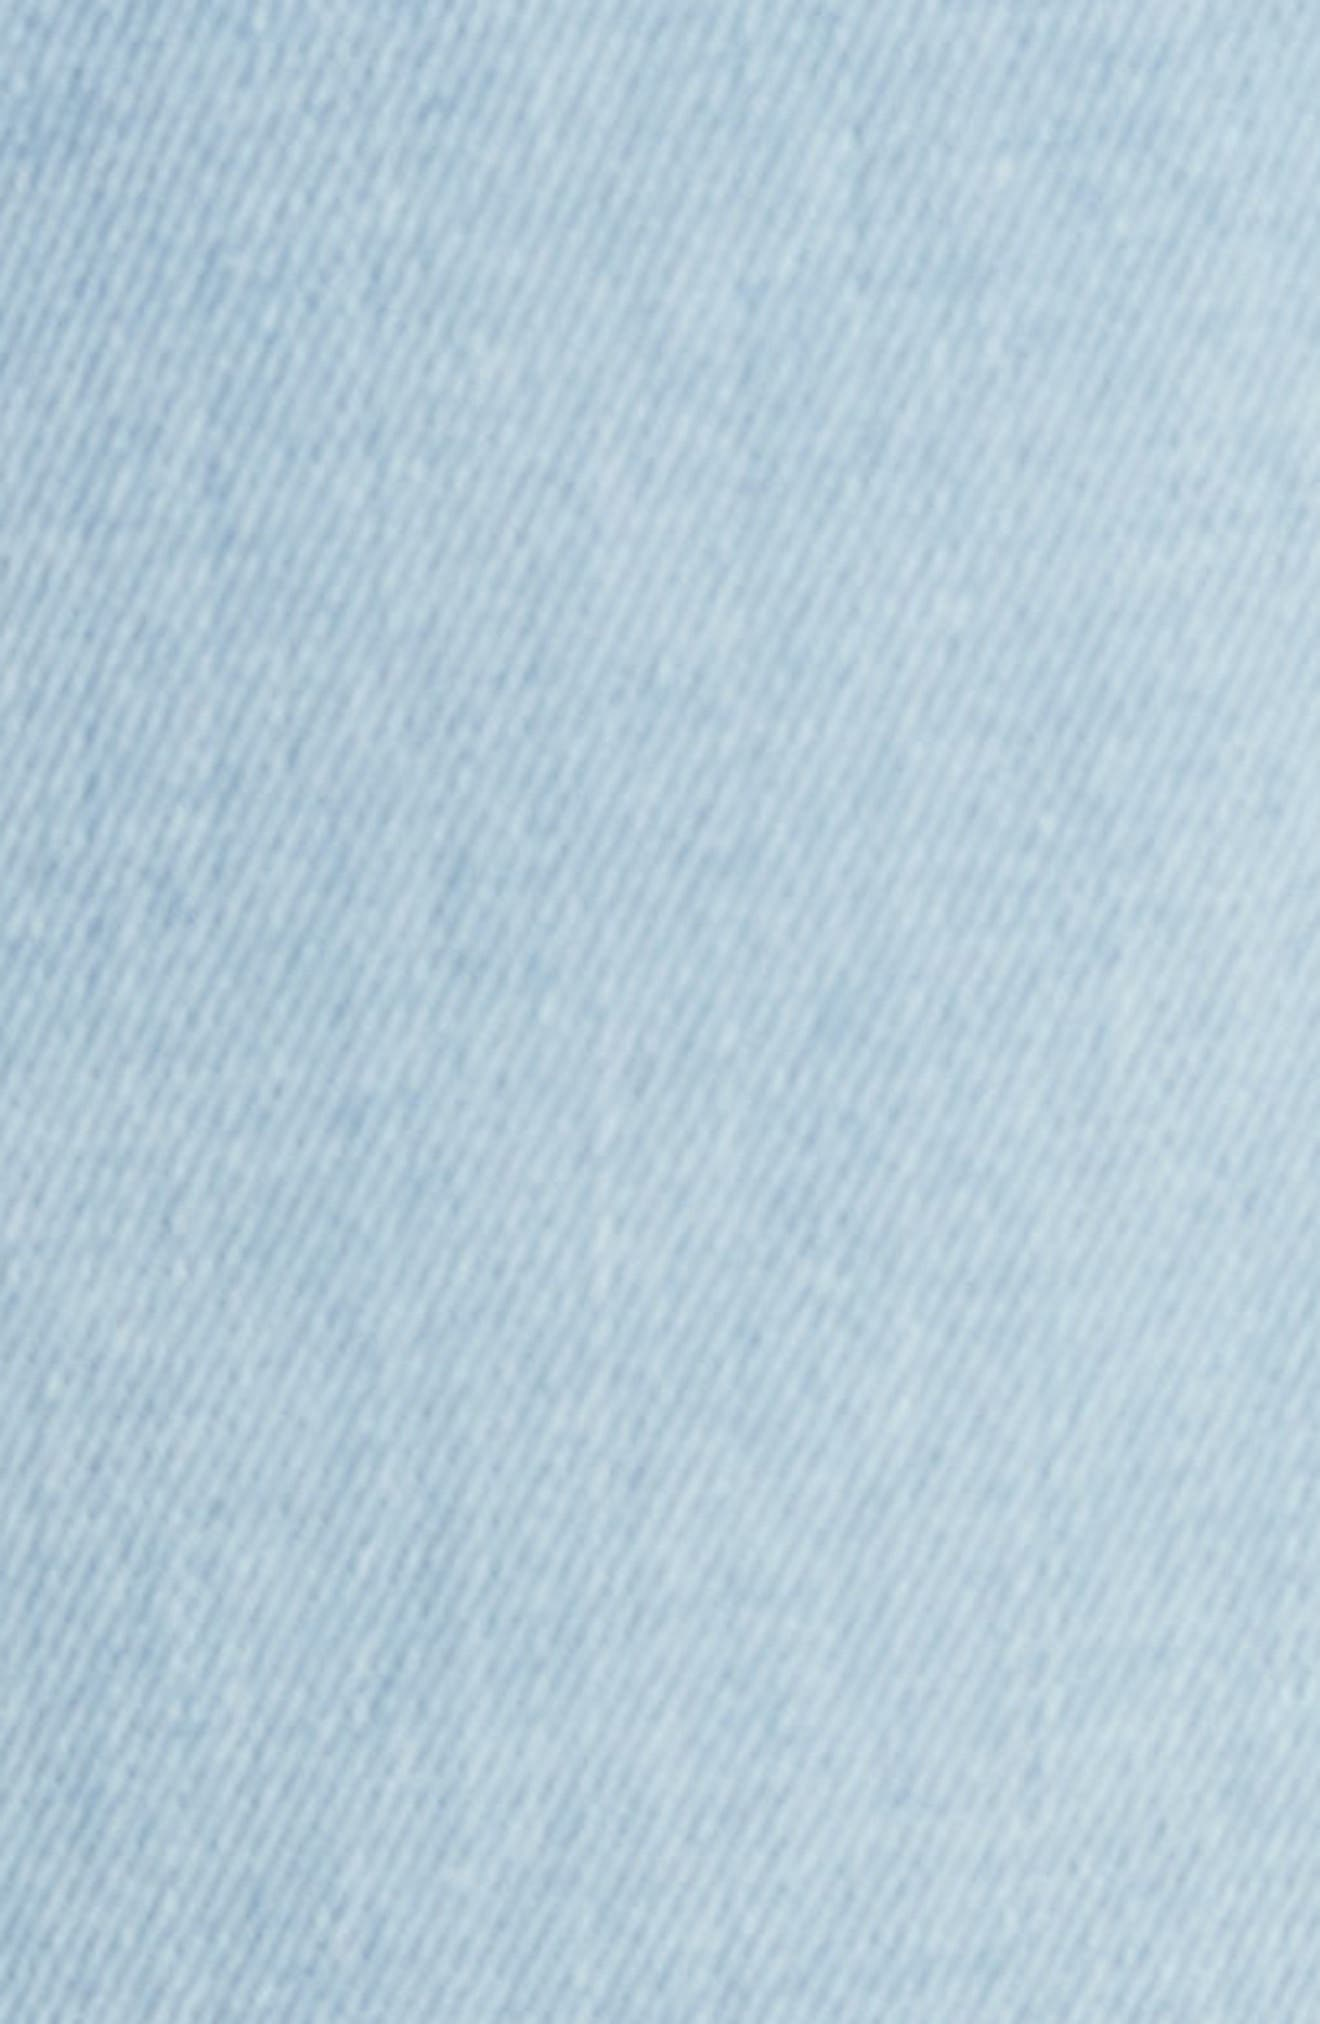 Mara Skinny Jeans,                             Alternate thumbnail 5, color,                             Blue